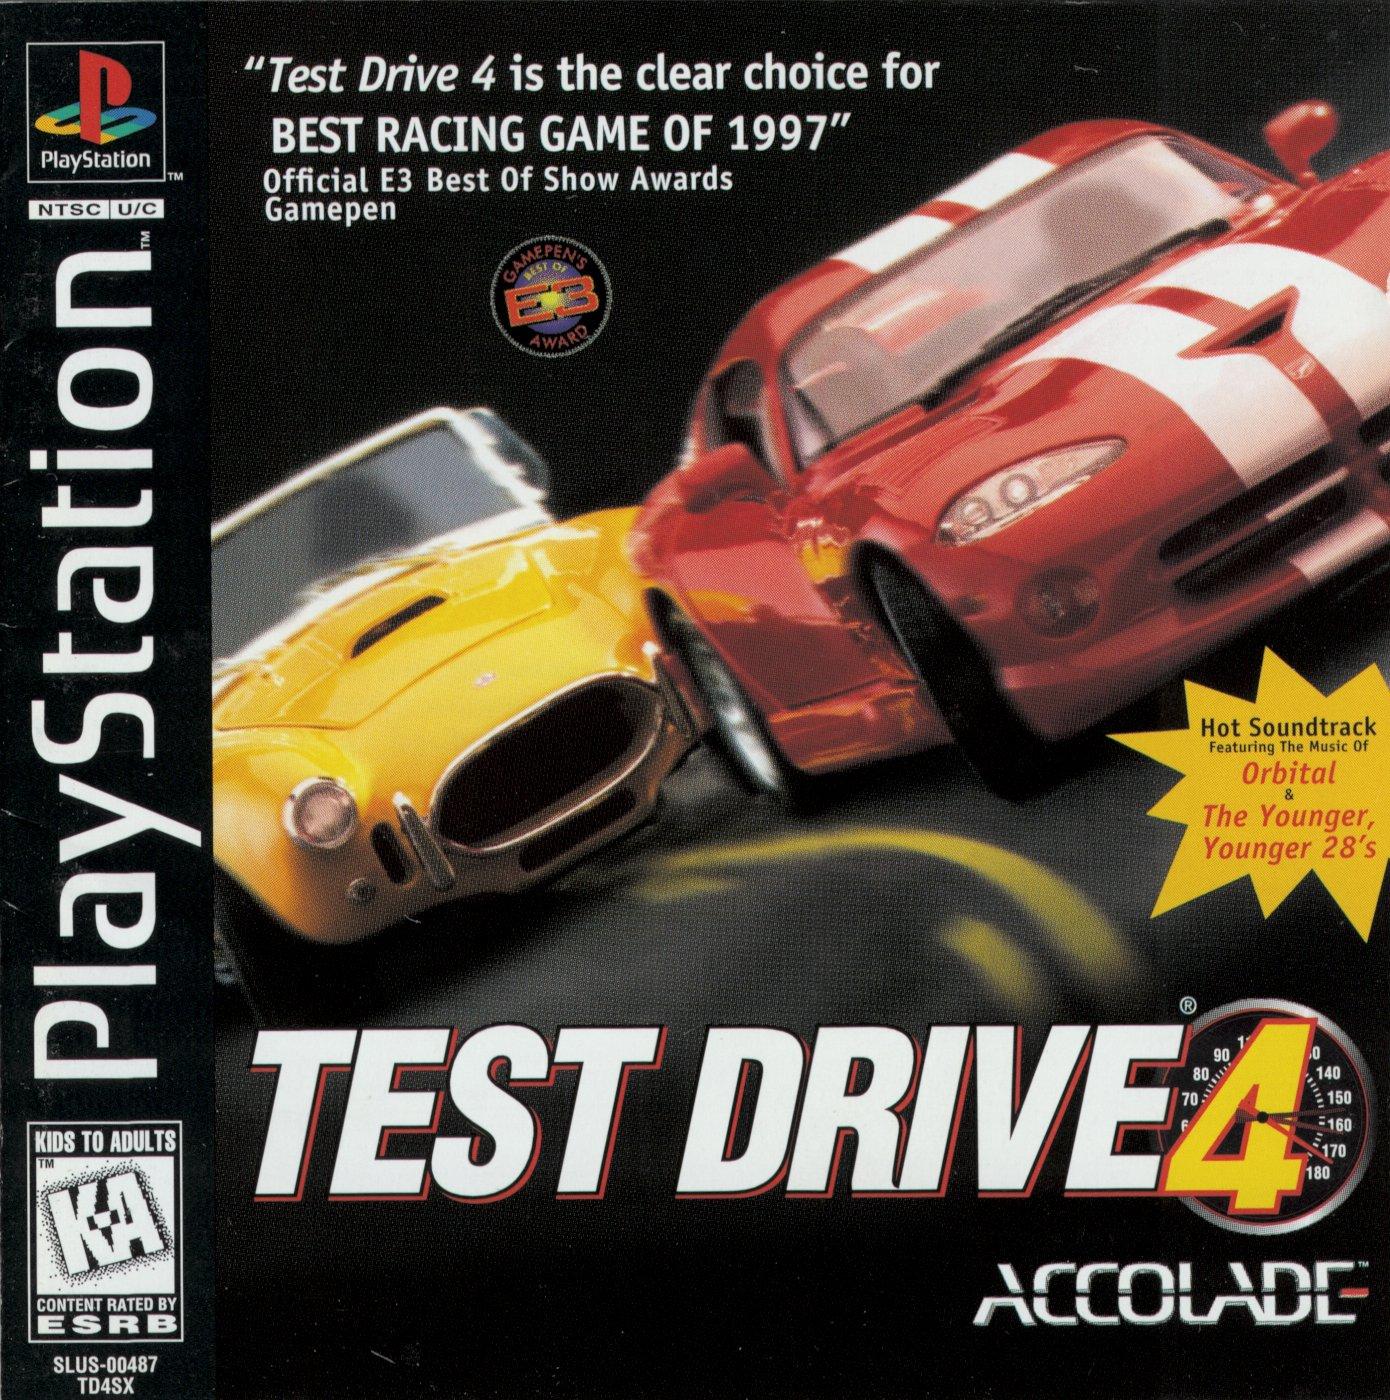 Test Drive 4 [SLUS-00487] ROM - Playstation (PS1) | Emulator Games